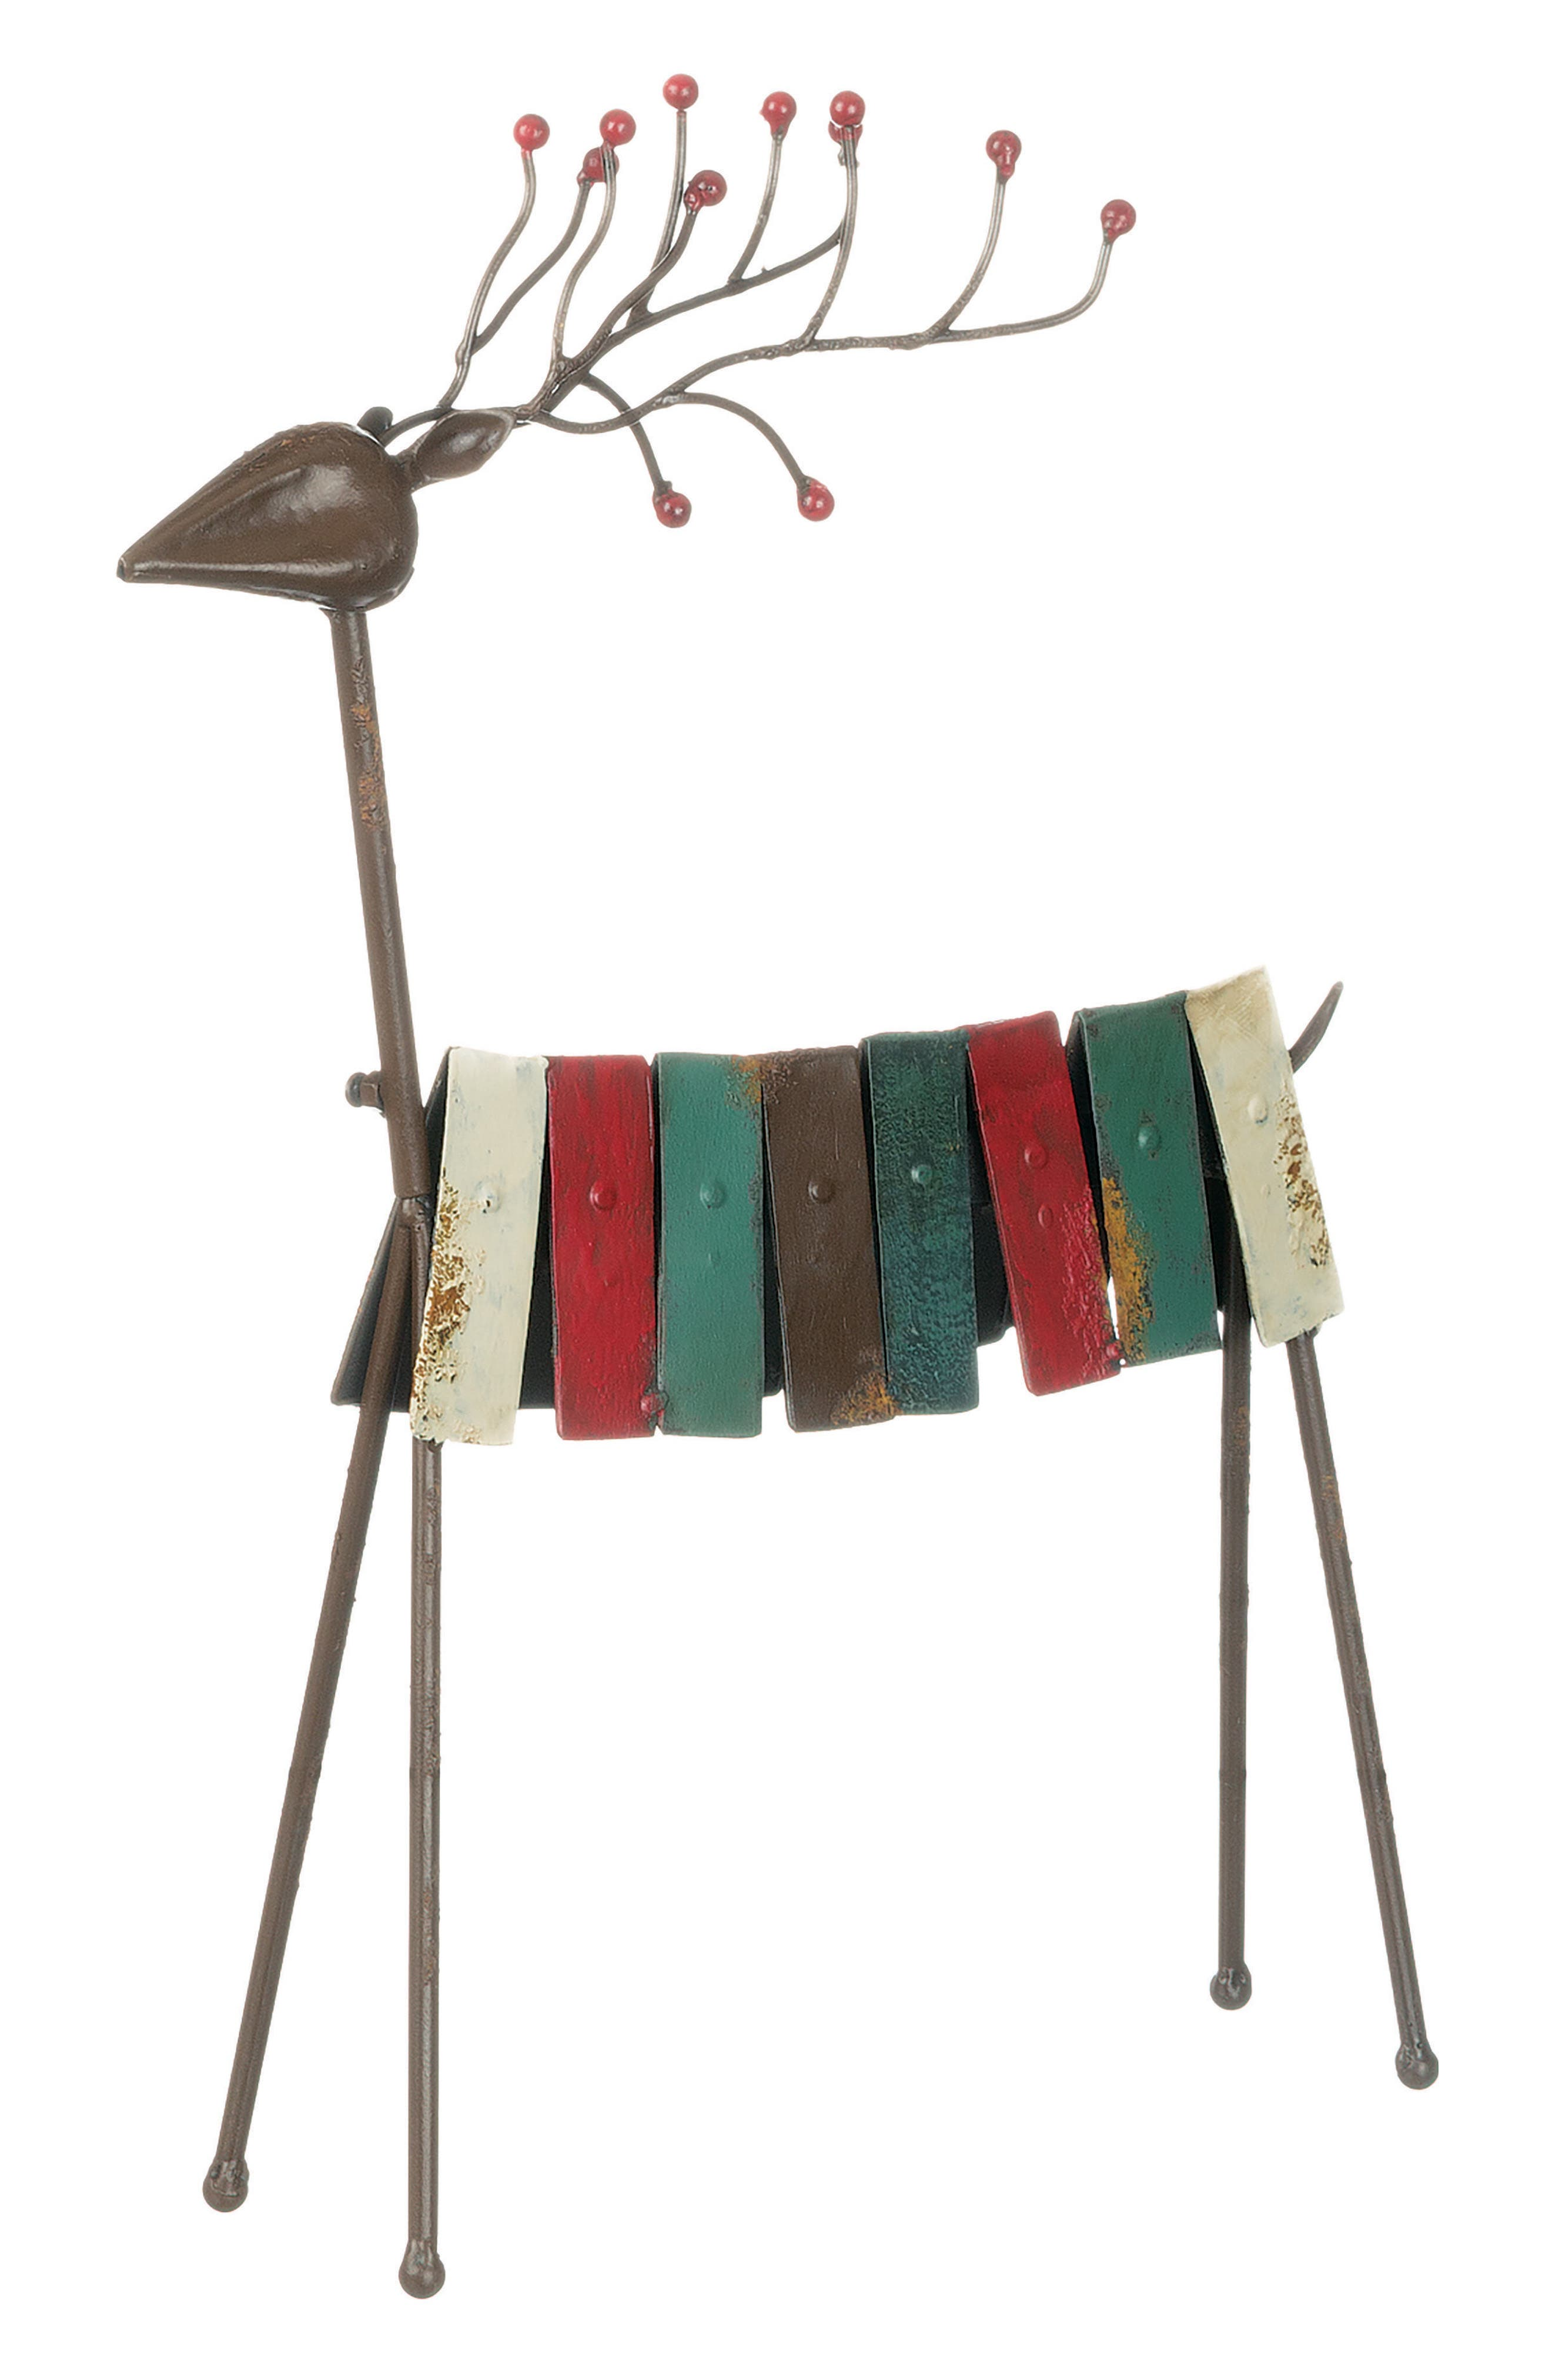 Alternate Image 1 Selected - Sullivans Metal Reindeer